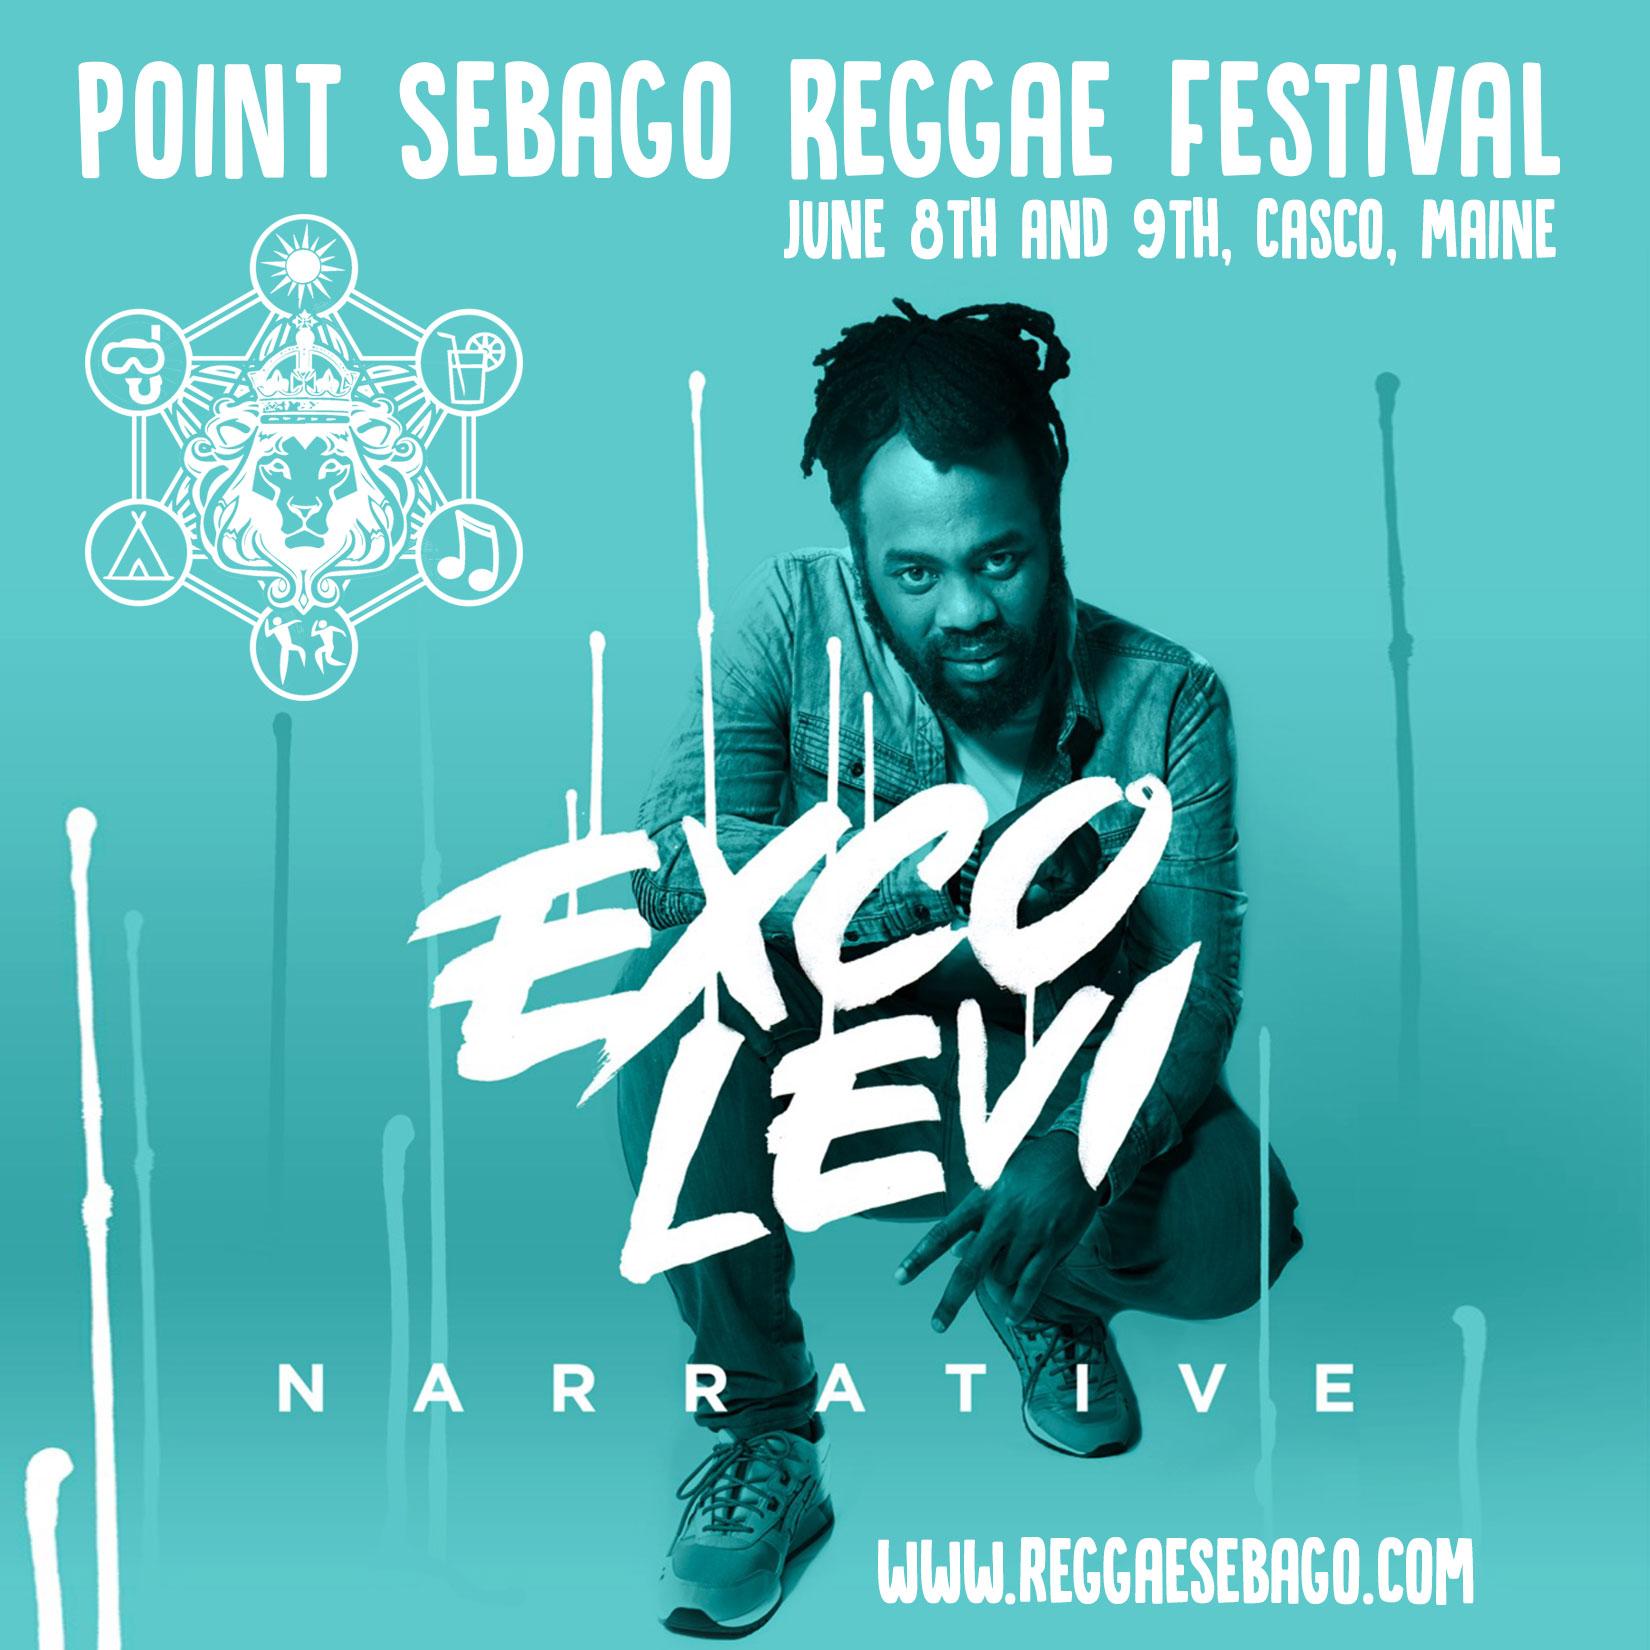 Exco Levi, Point Sebago Reggae Festival